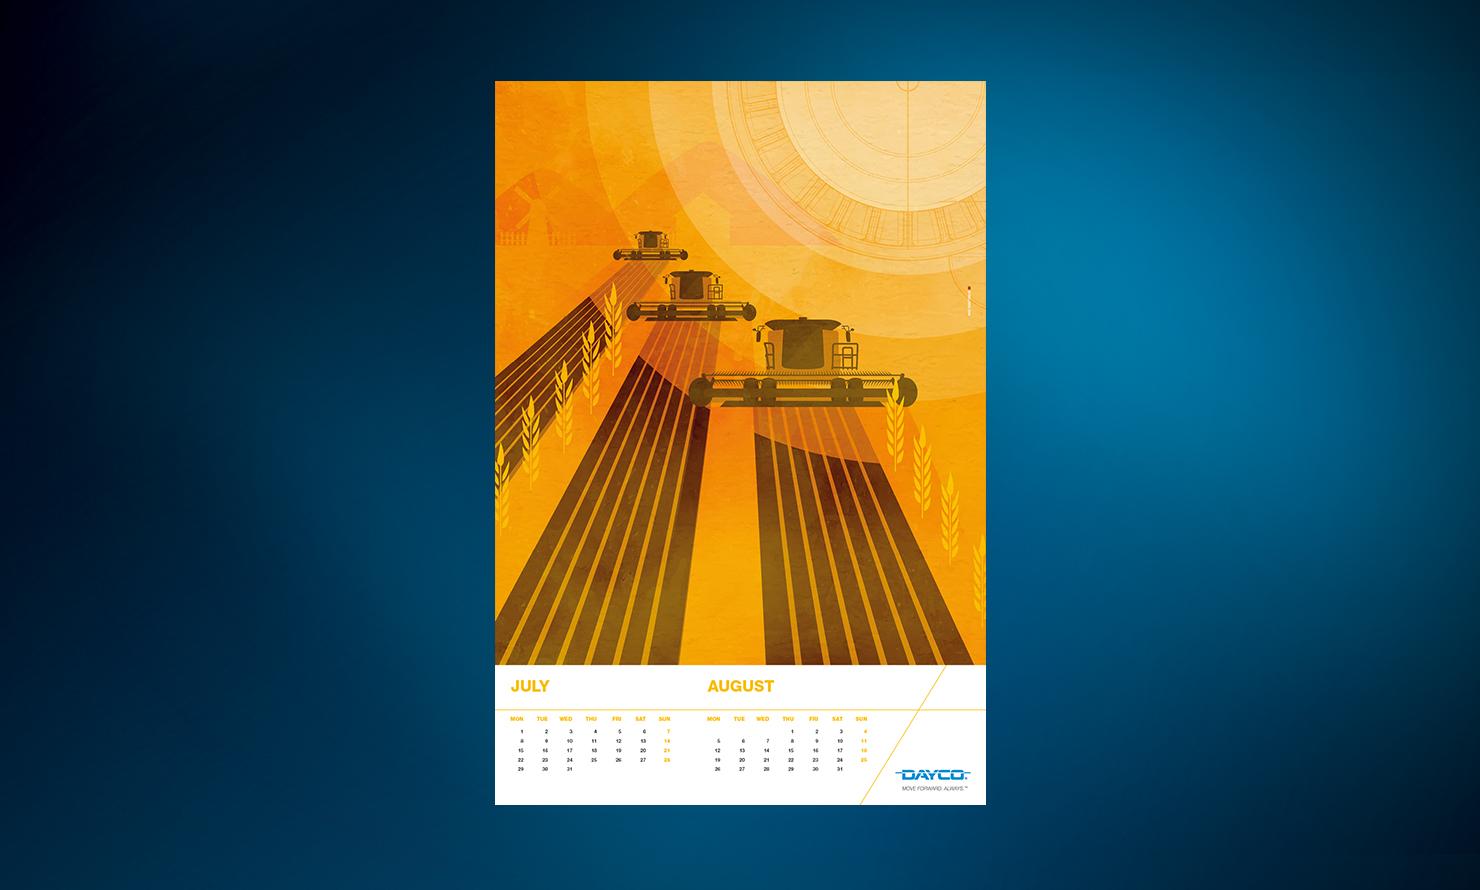 https://www.kubelibre.com/uploads/Slider-work-tutti-clienti/dayco-calendario-2019-4.jpg